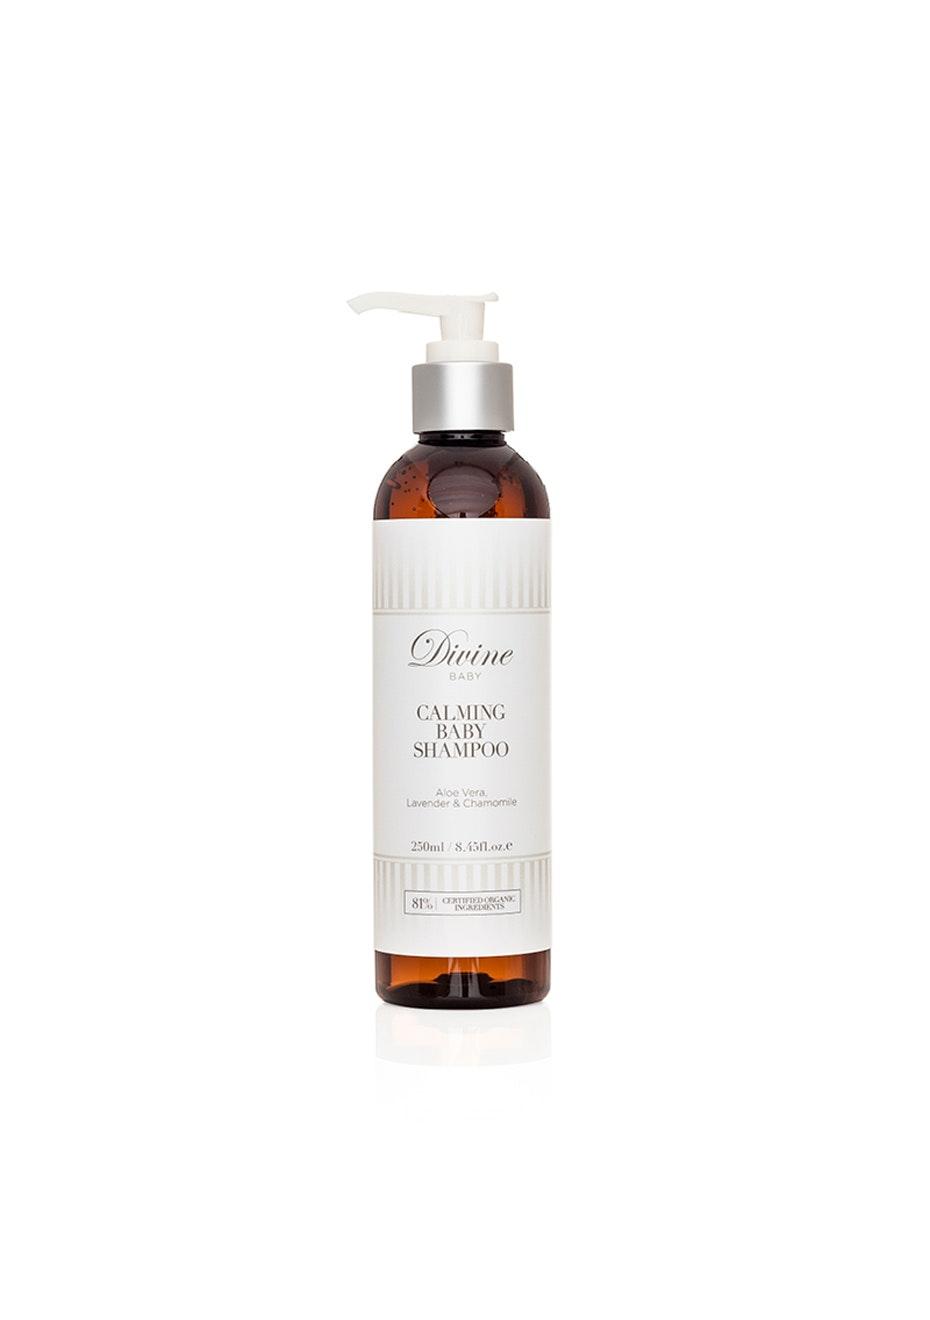 Divine Baby - Calming Baby Shampoo 250ml